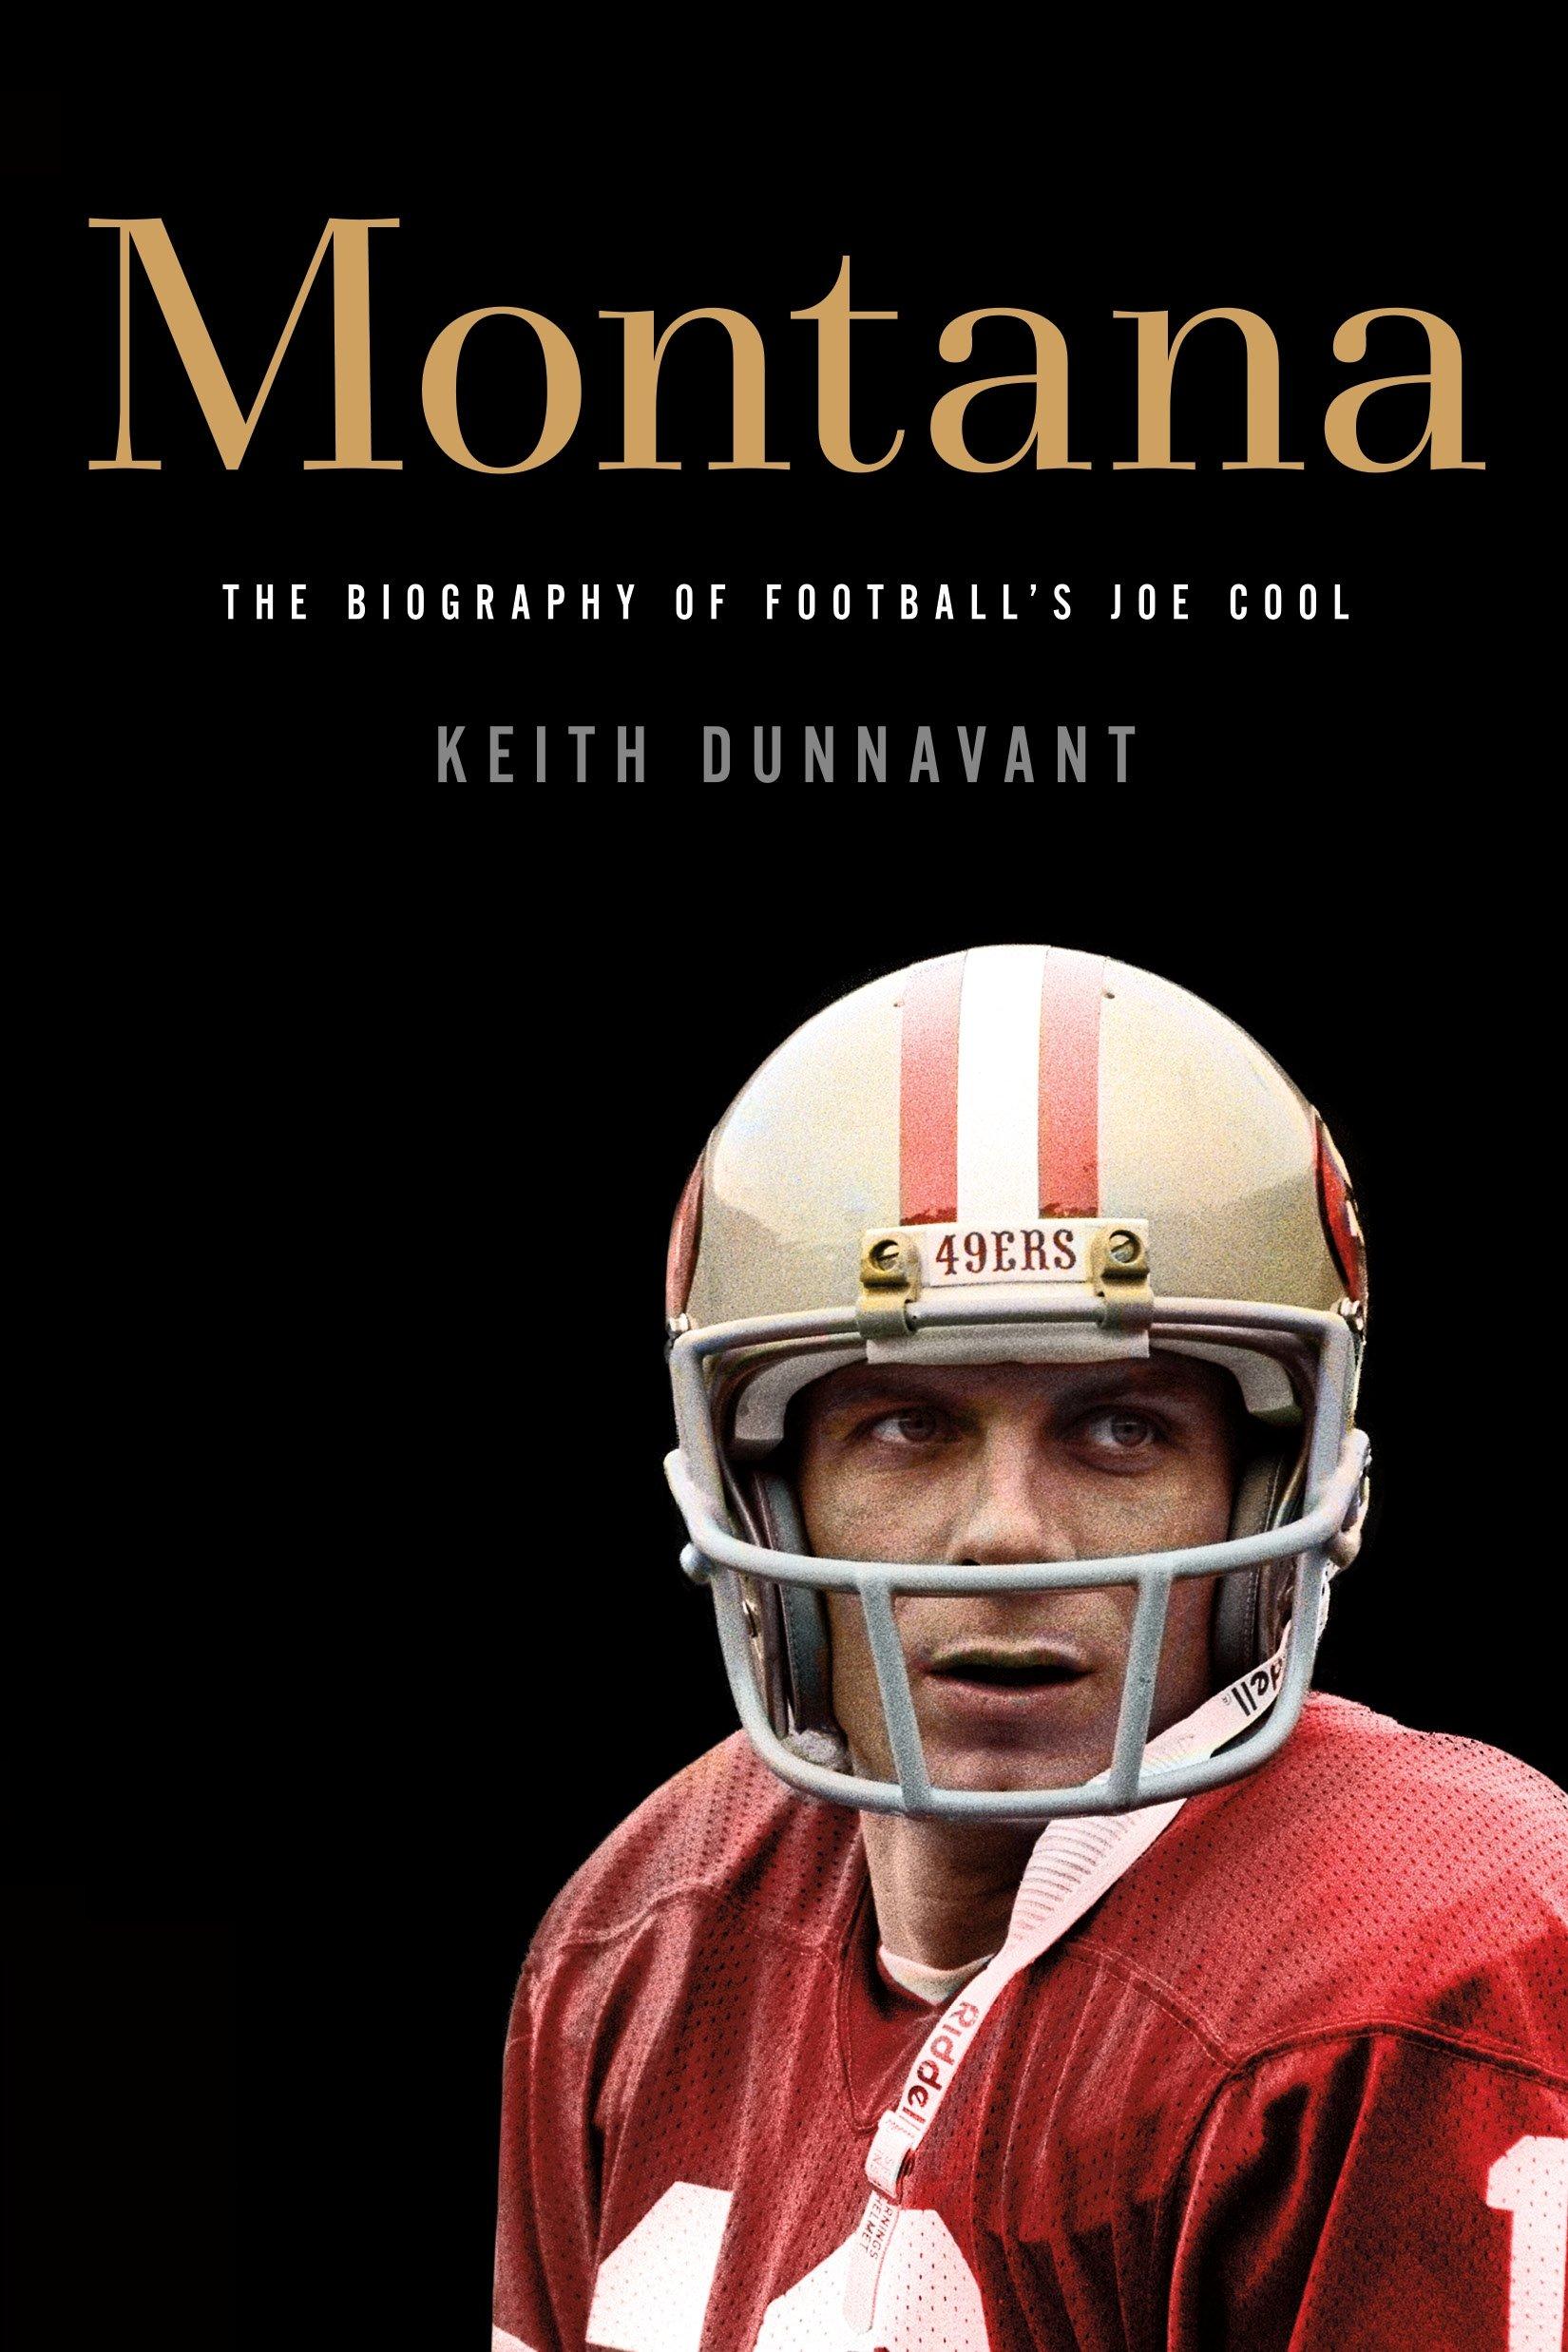 Montana: The Biography of Football's Joe Cool: Keith Dunnavant:  9781250017857: Amazon.com: Books